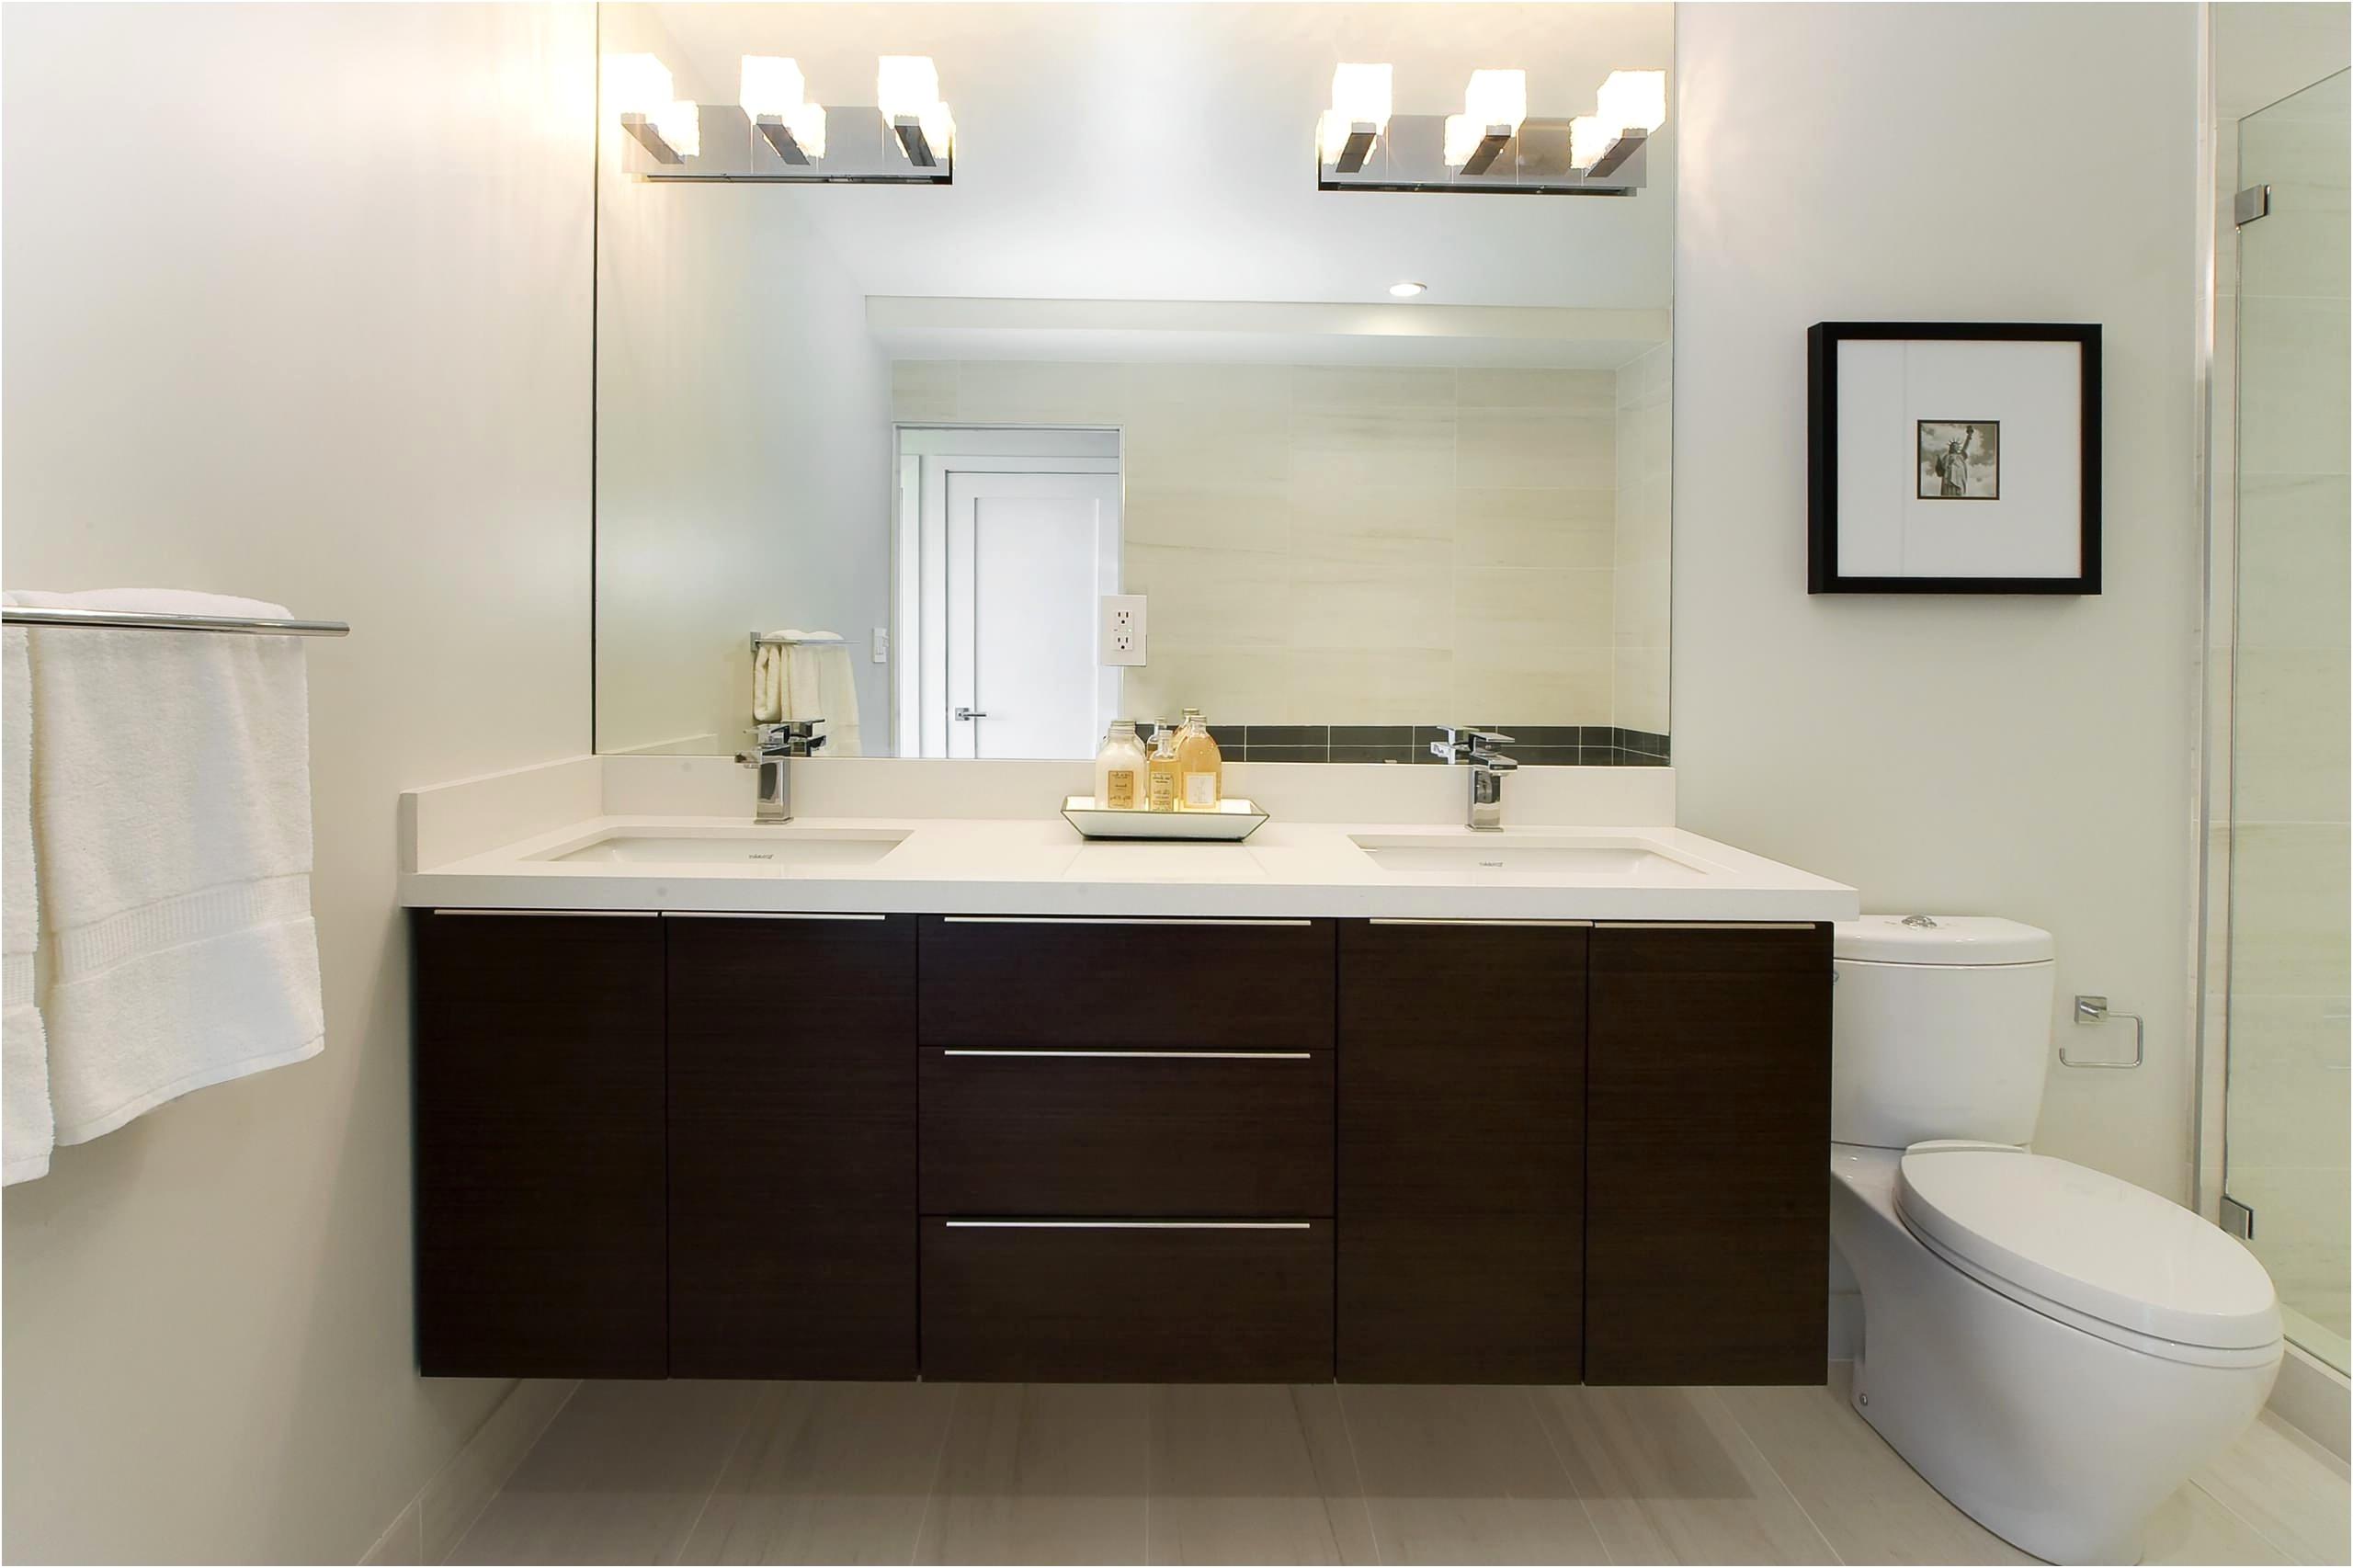 Extraordinary Corner Vanities for Small Bathrooms with Divine 38 Bathroom Vanity Bathroom Elegant Ideas 0d Wodfreview